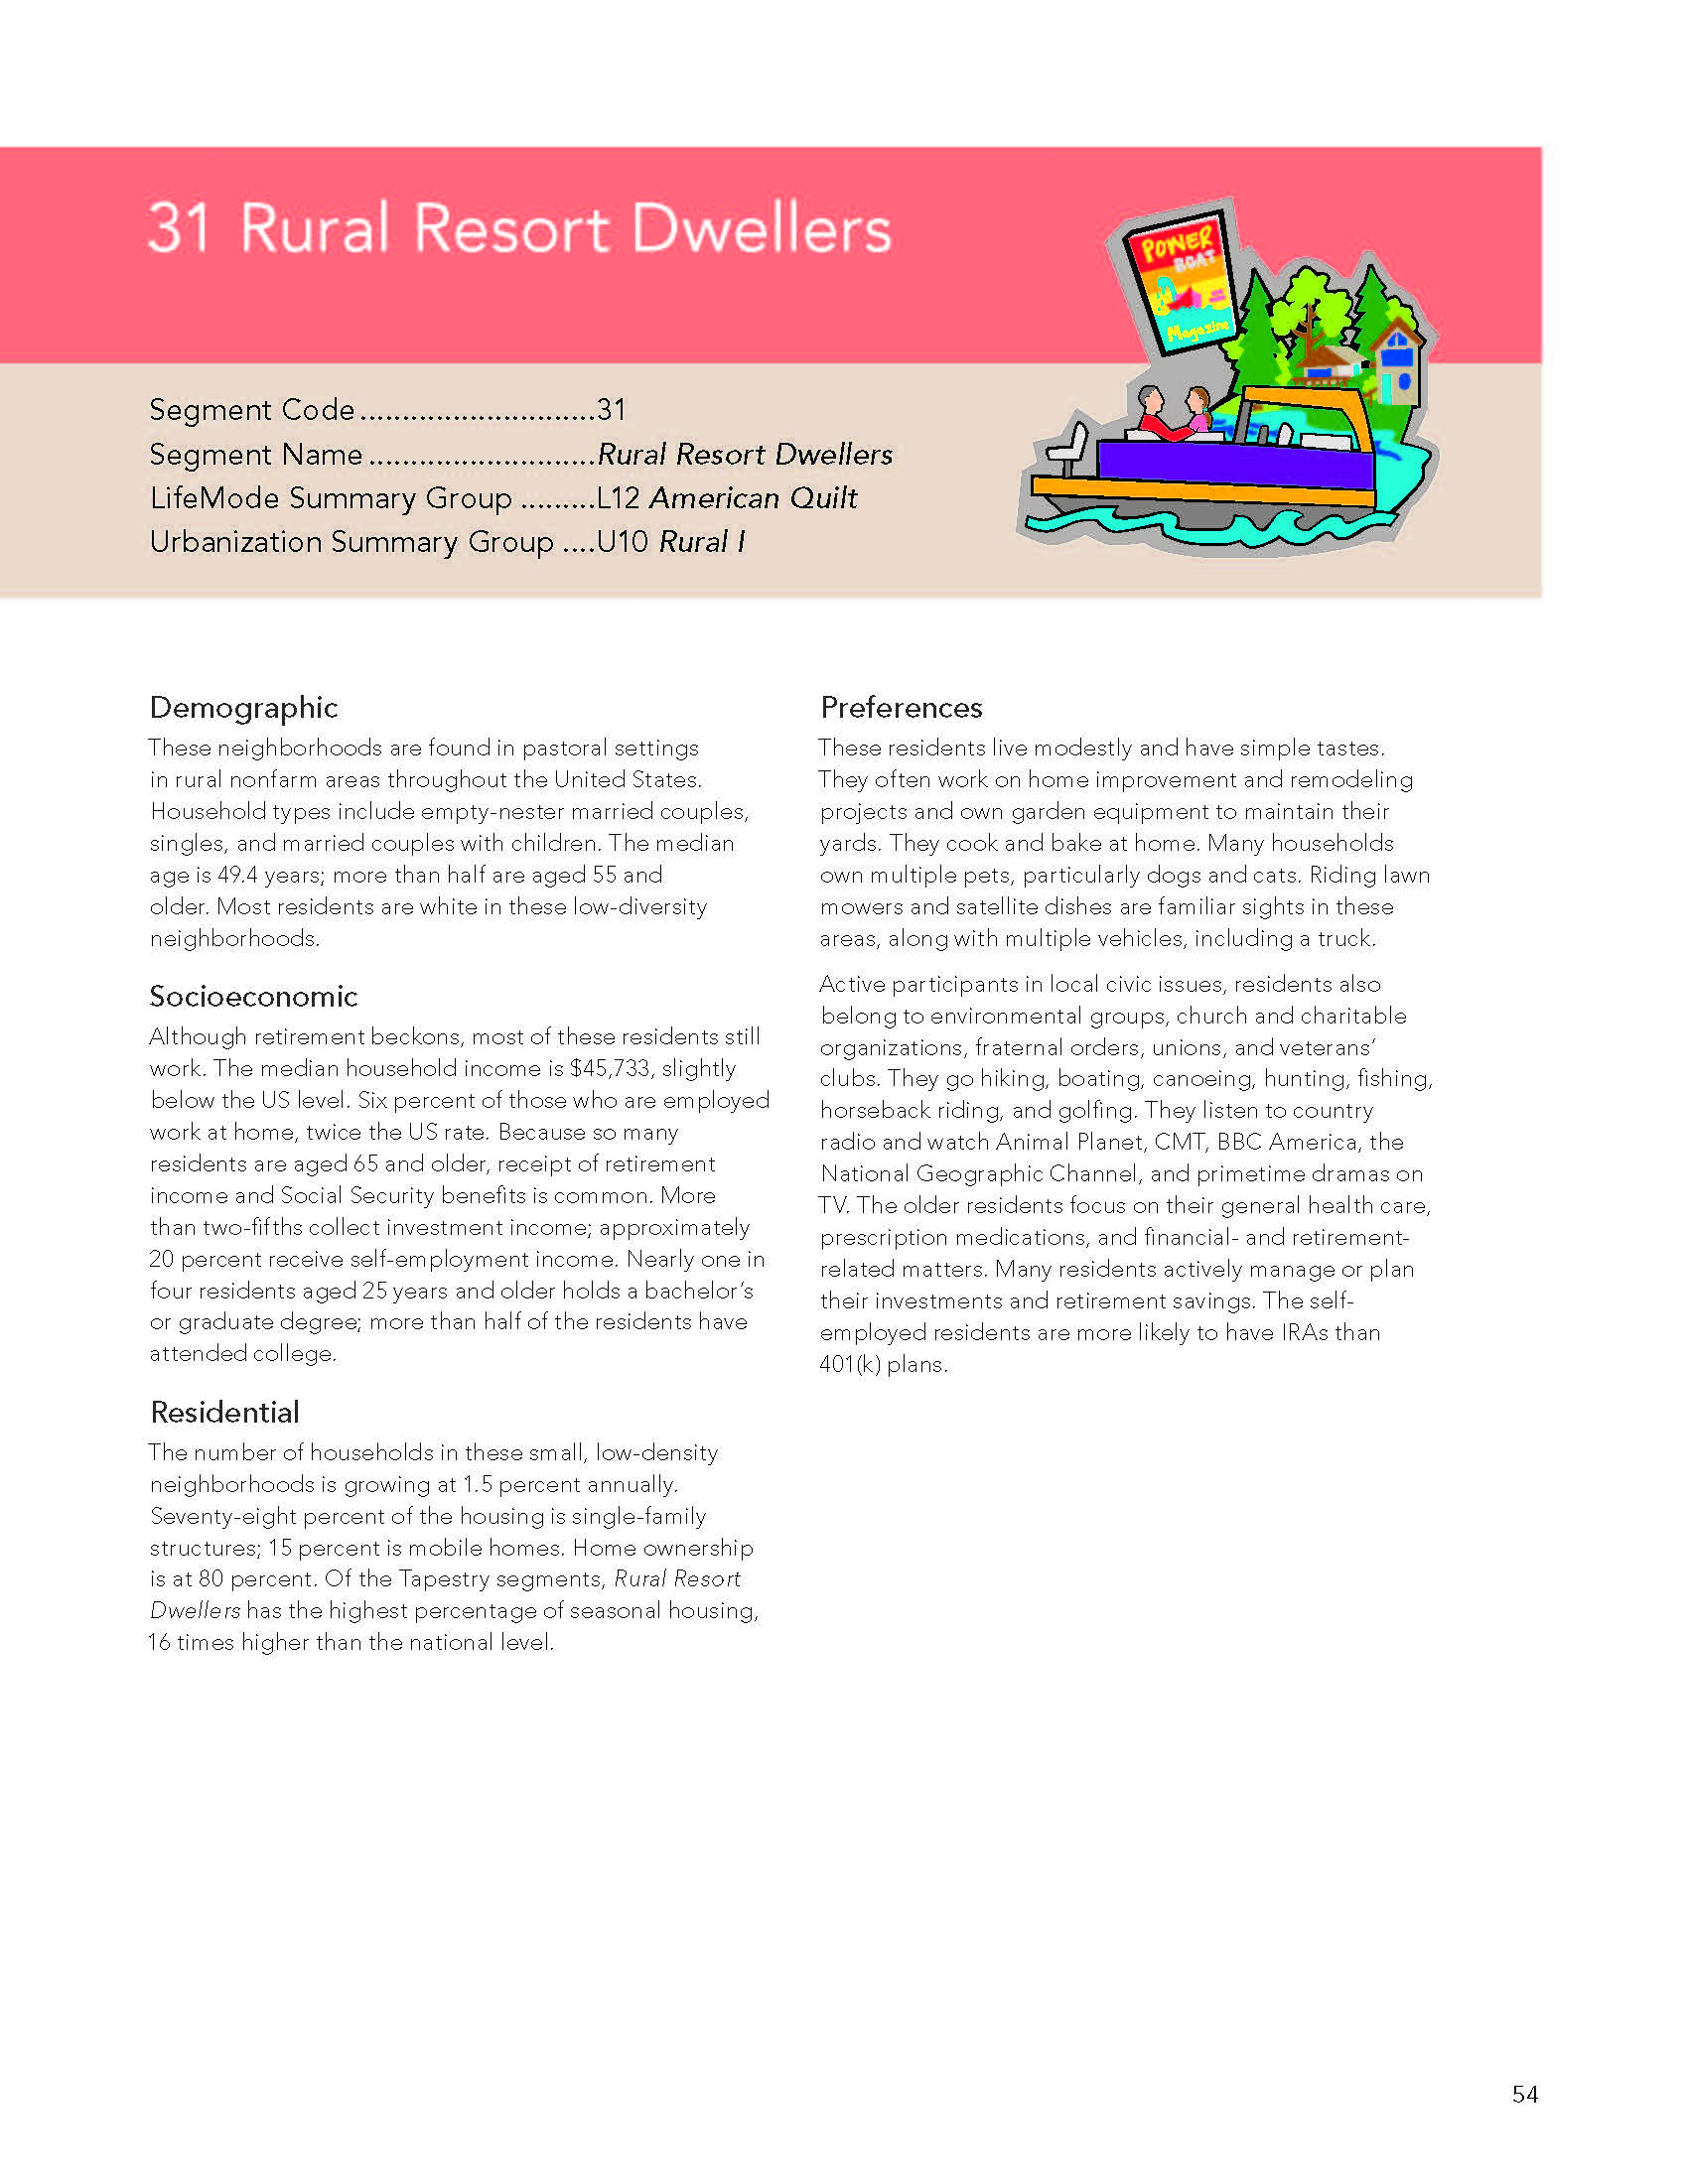 tapestry-segmentation_Page_57.jpg